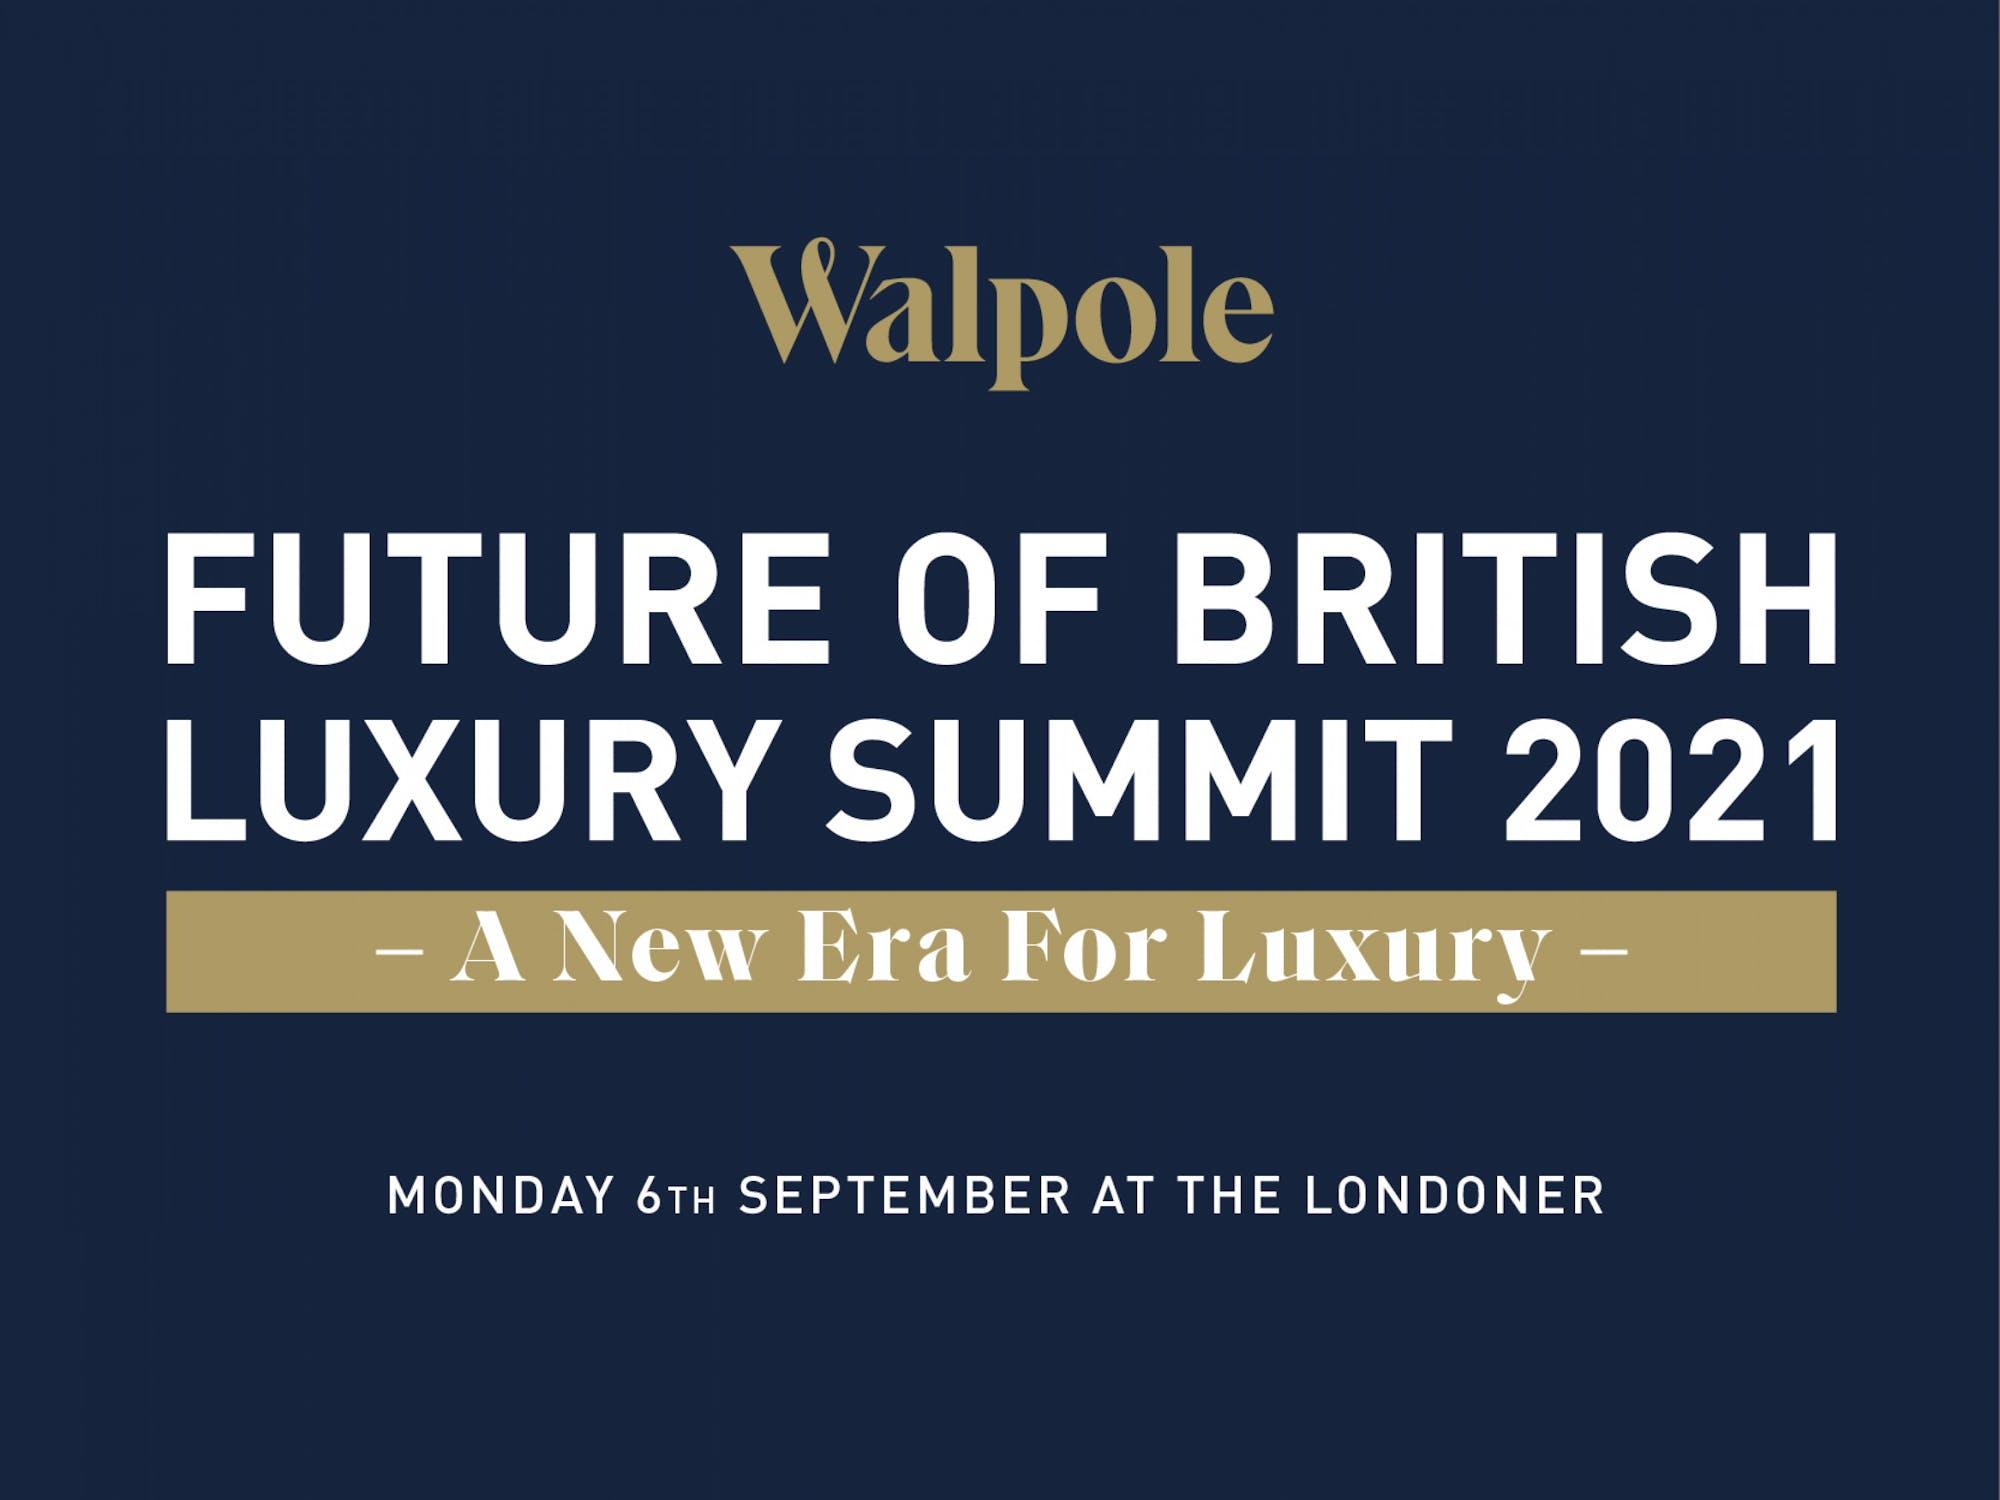 Walpole Summit The Future of British Luxury by Lisa Yeates, Facebook